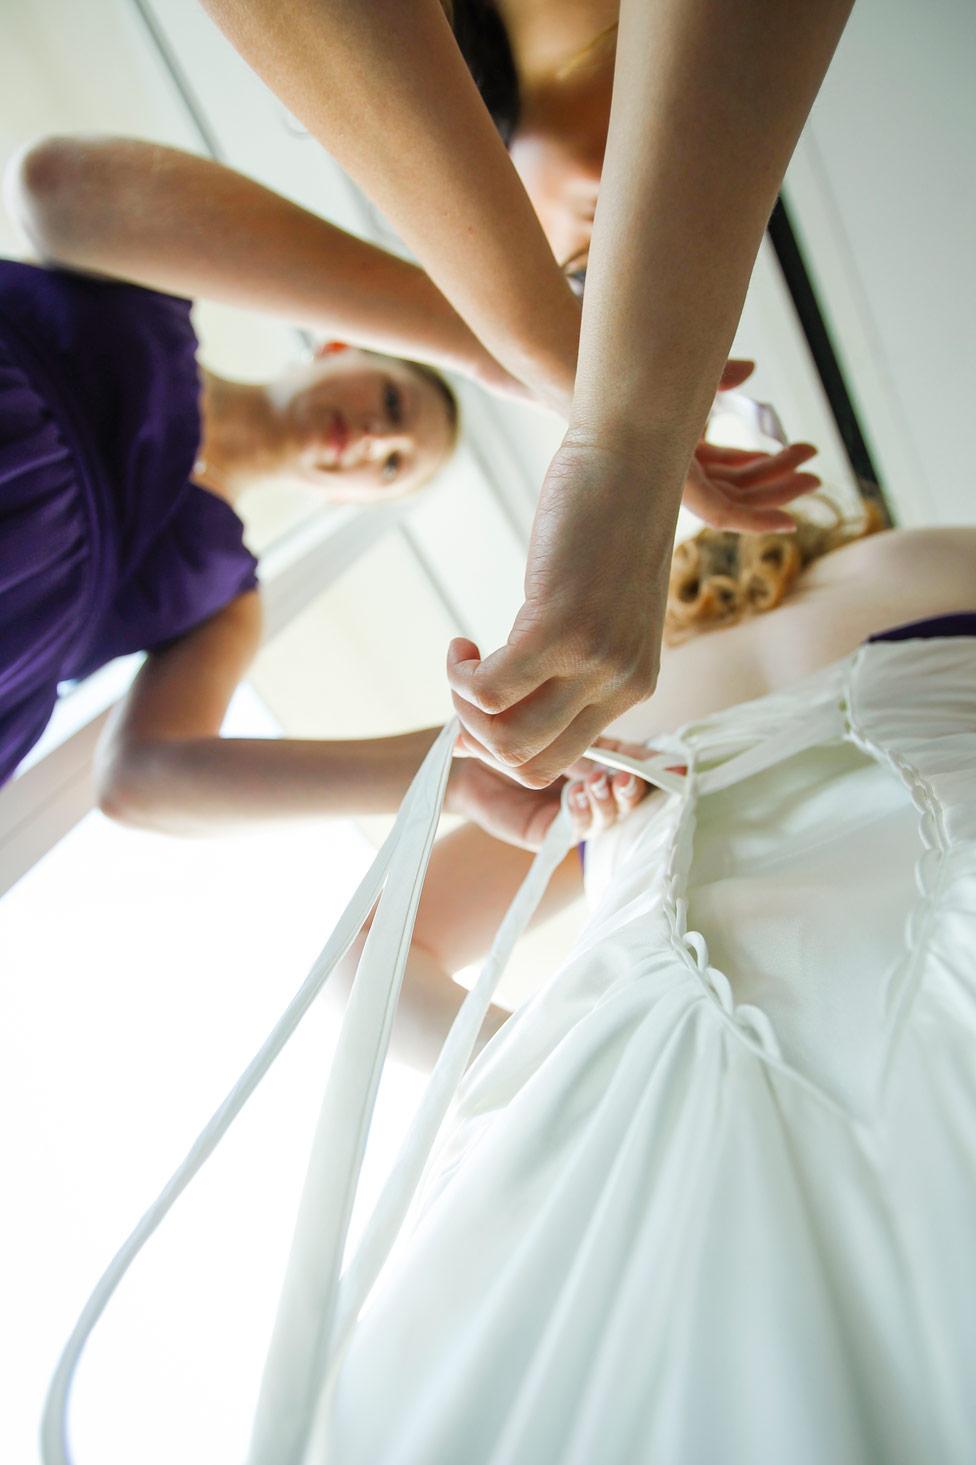 milwaukee-discovery-world-pier-wisconsin-wedding-ruthie-hauge-photography-06.jpg